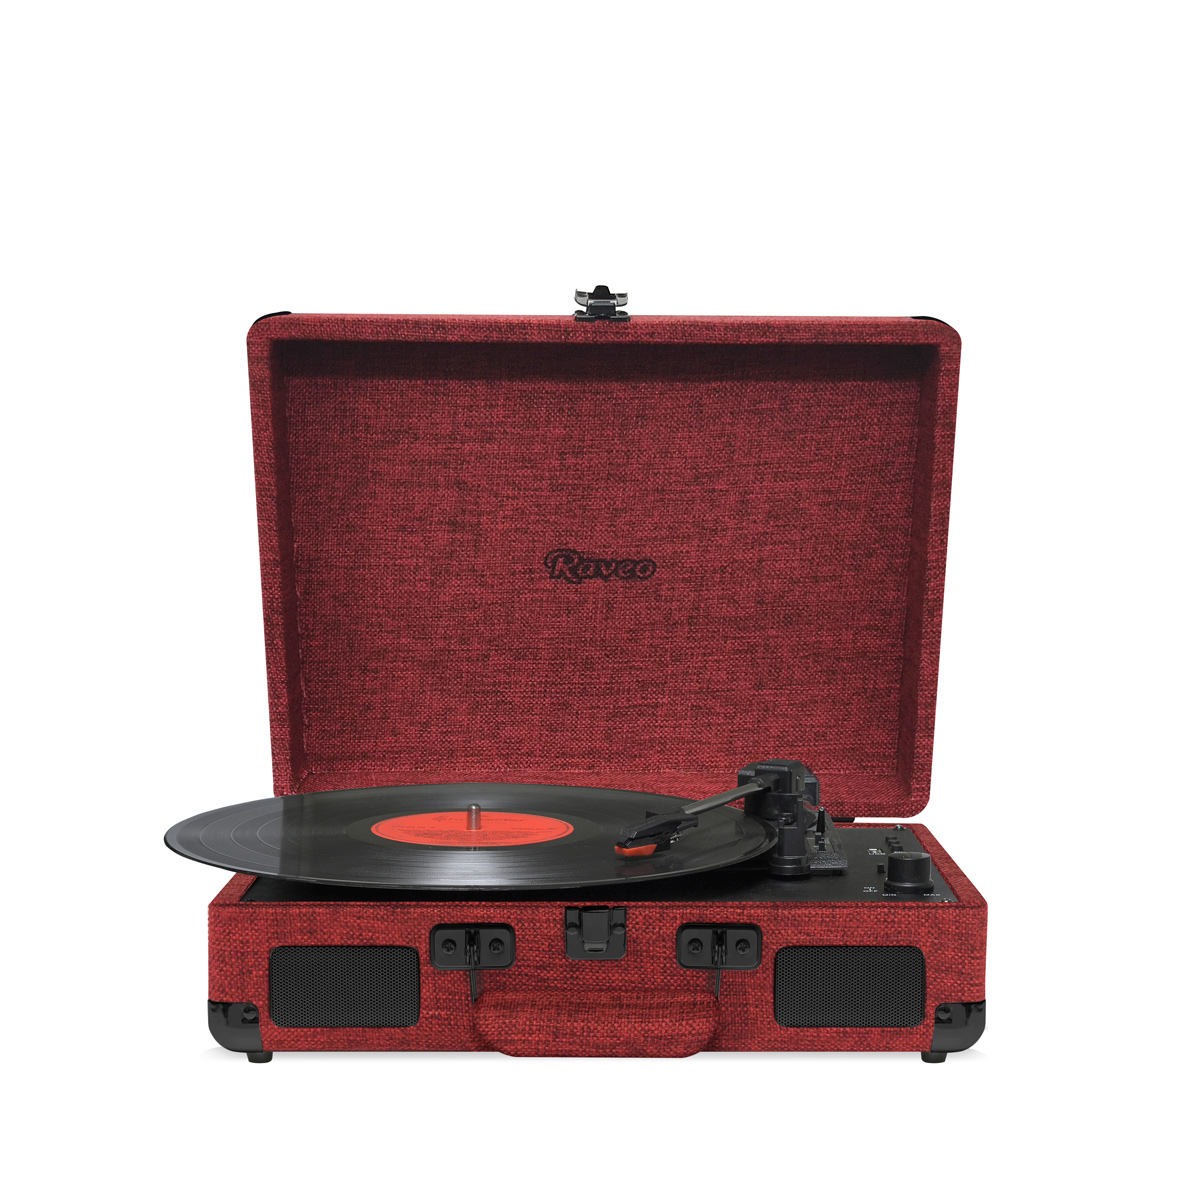 Vitrola Retrô Raveo Sonetto Onix Fire, Toca Discos, USB, Bluetooth, Reproduz e Grava Vinil